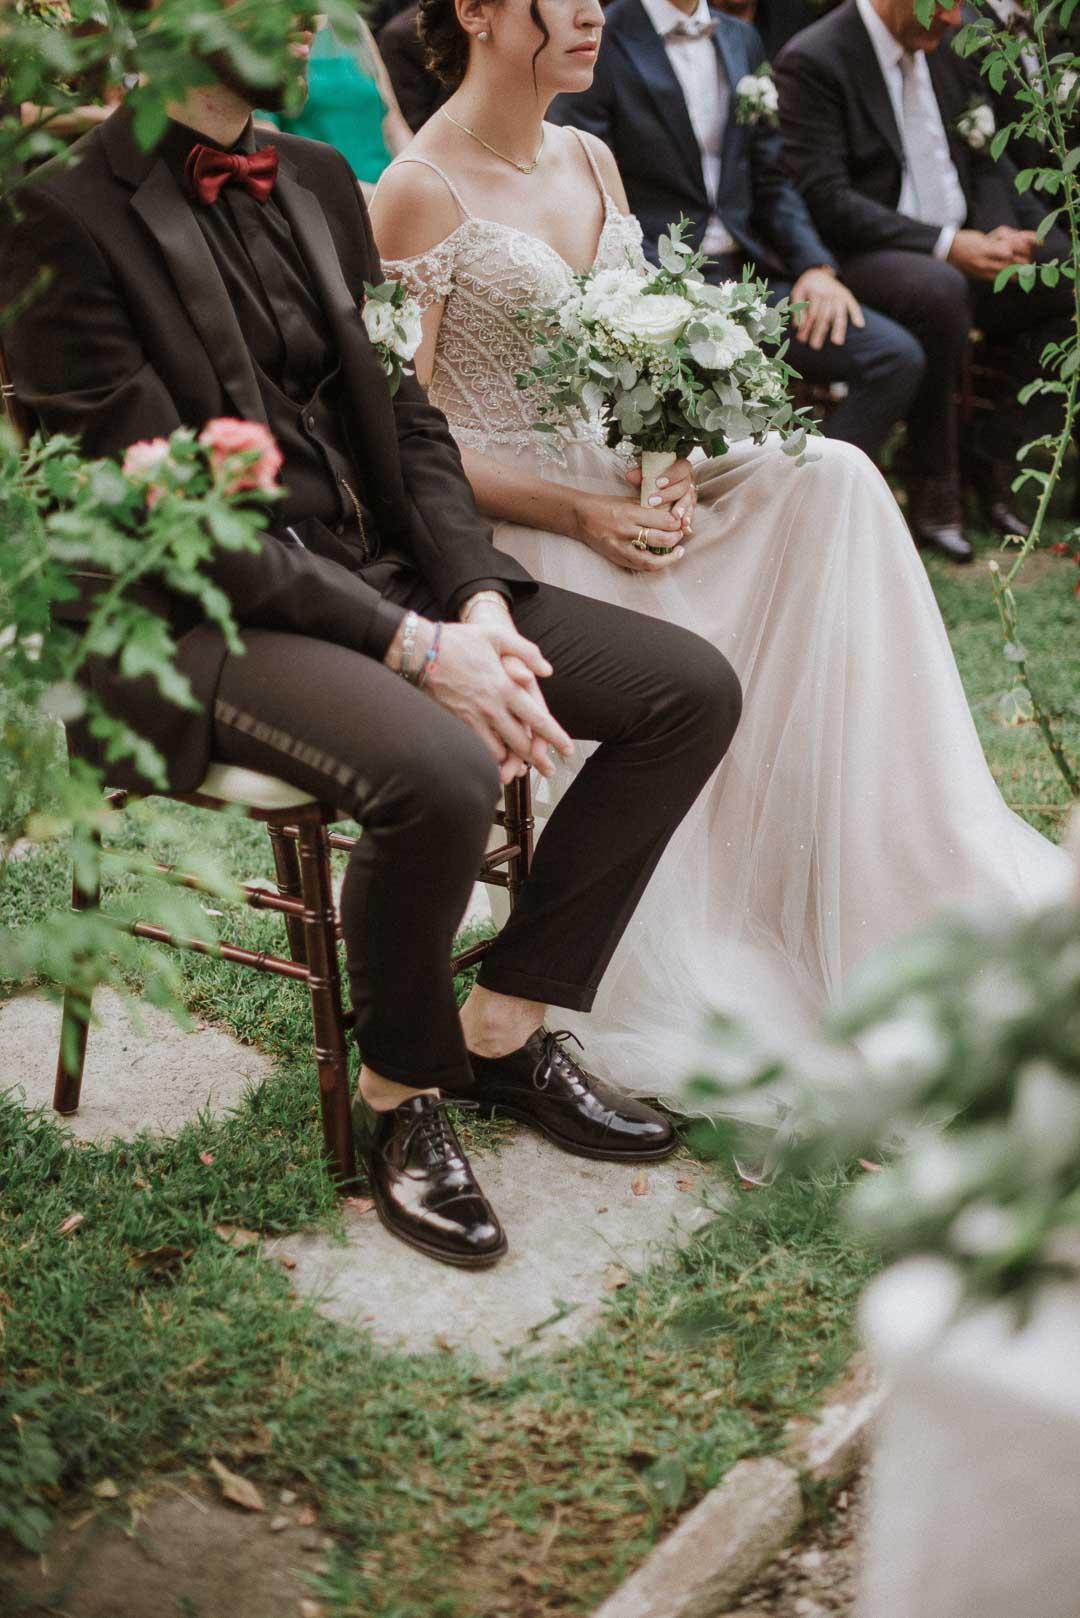 wedding-photographer-destination-fineart-bespoke-reportage-tuscany-villascorzi-vivianeizzo-spazio46-79